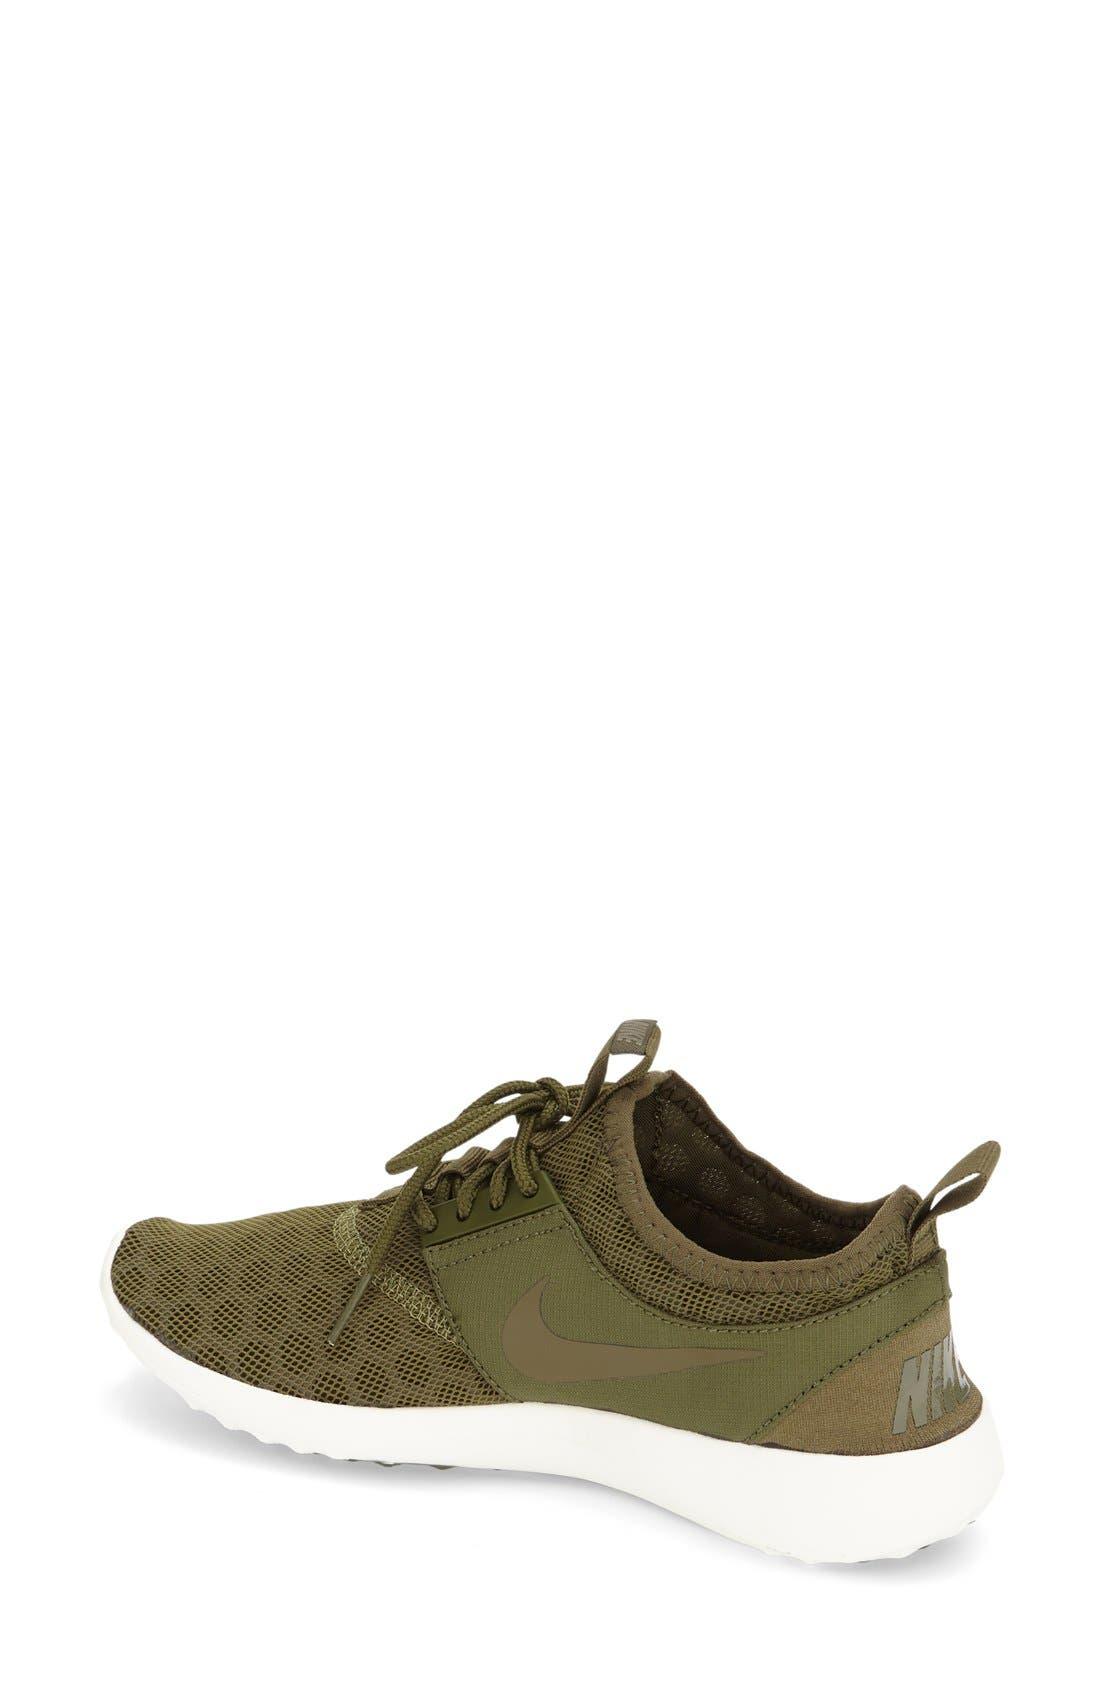 Juvenate Sneaker,                             Alternate thumbnail 86, color,